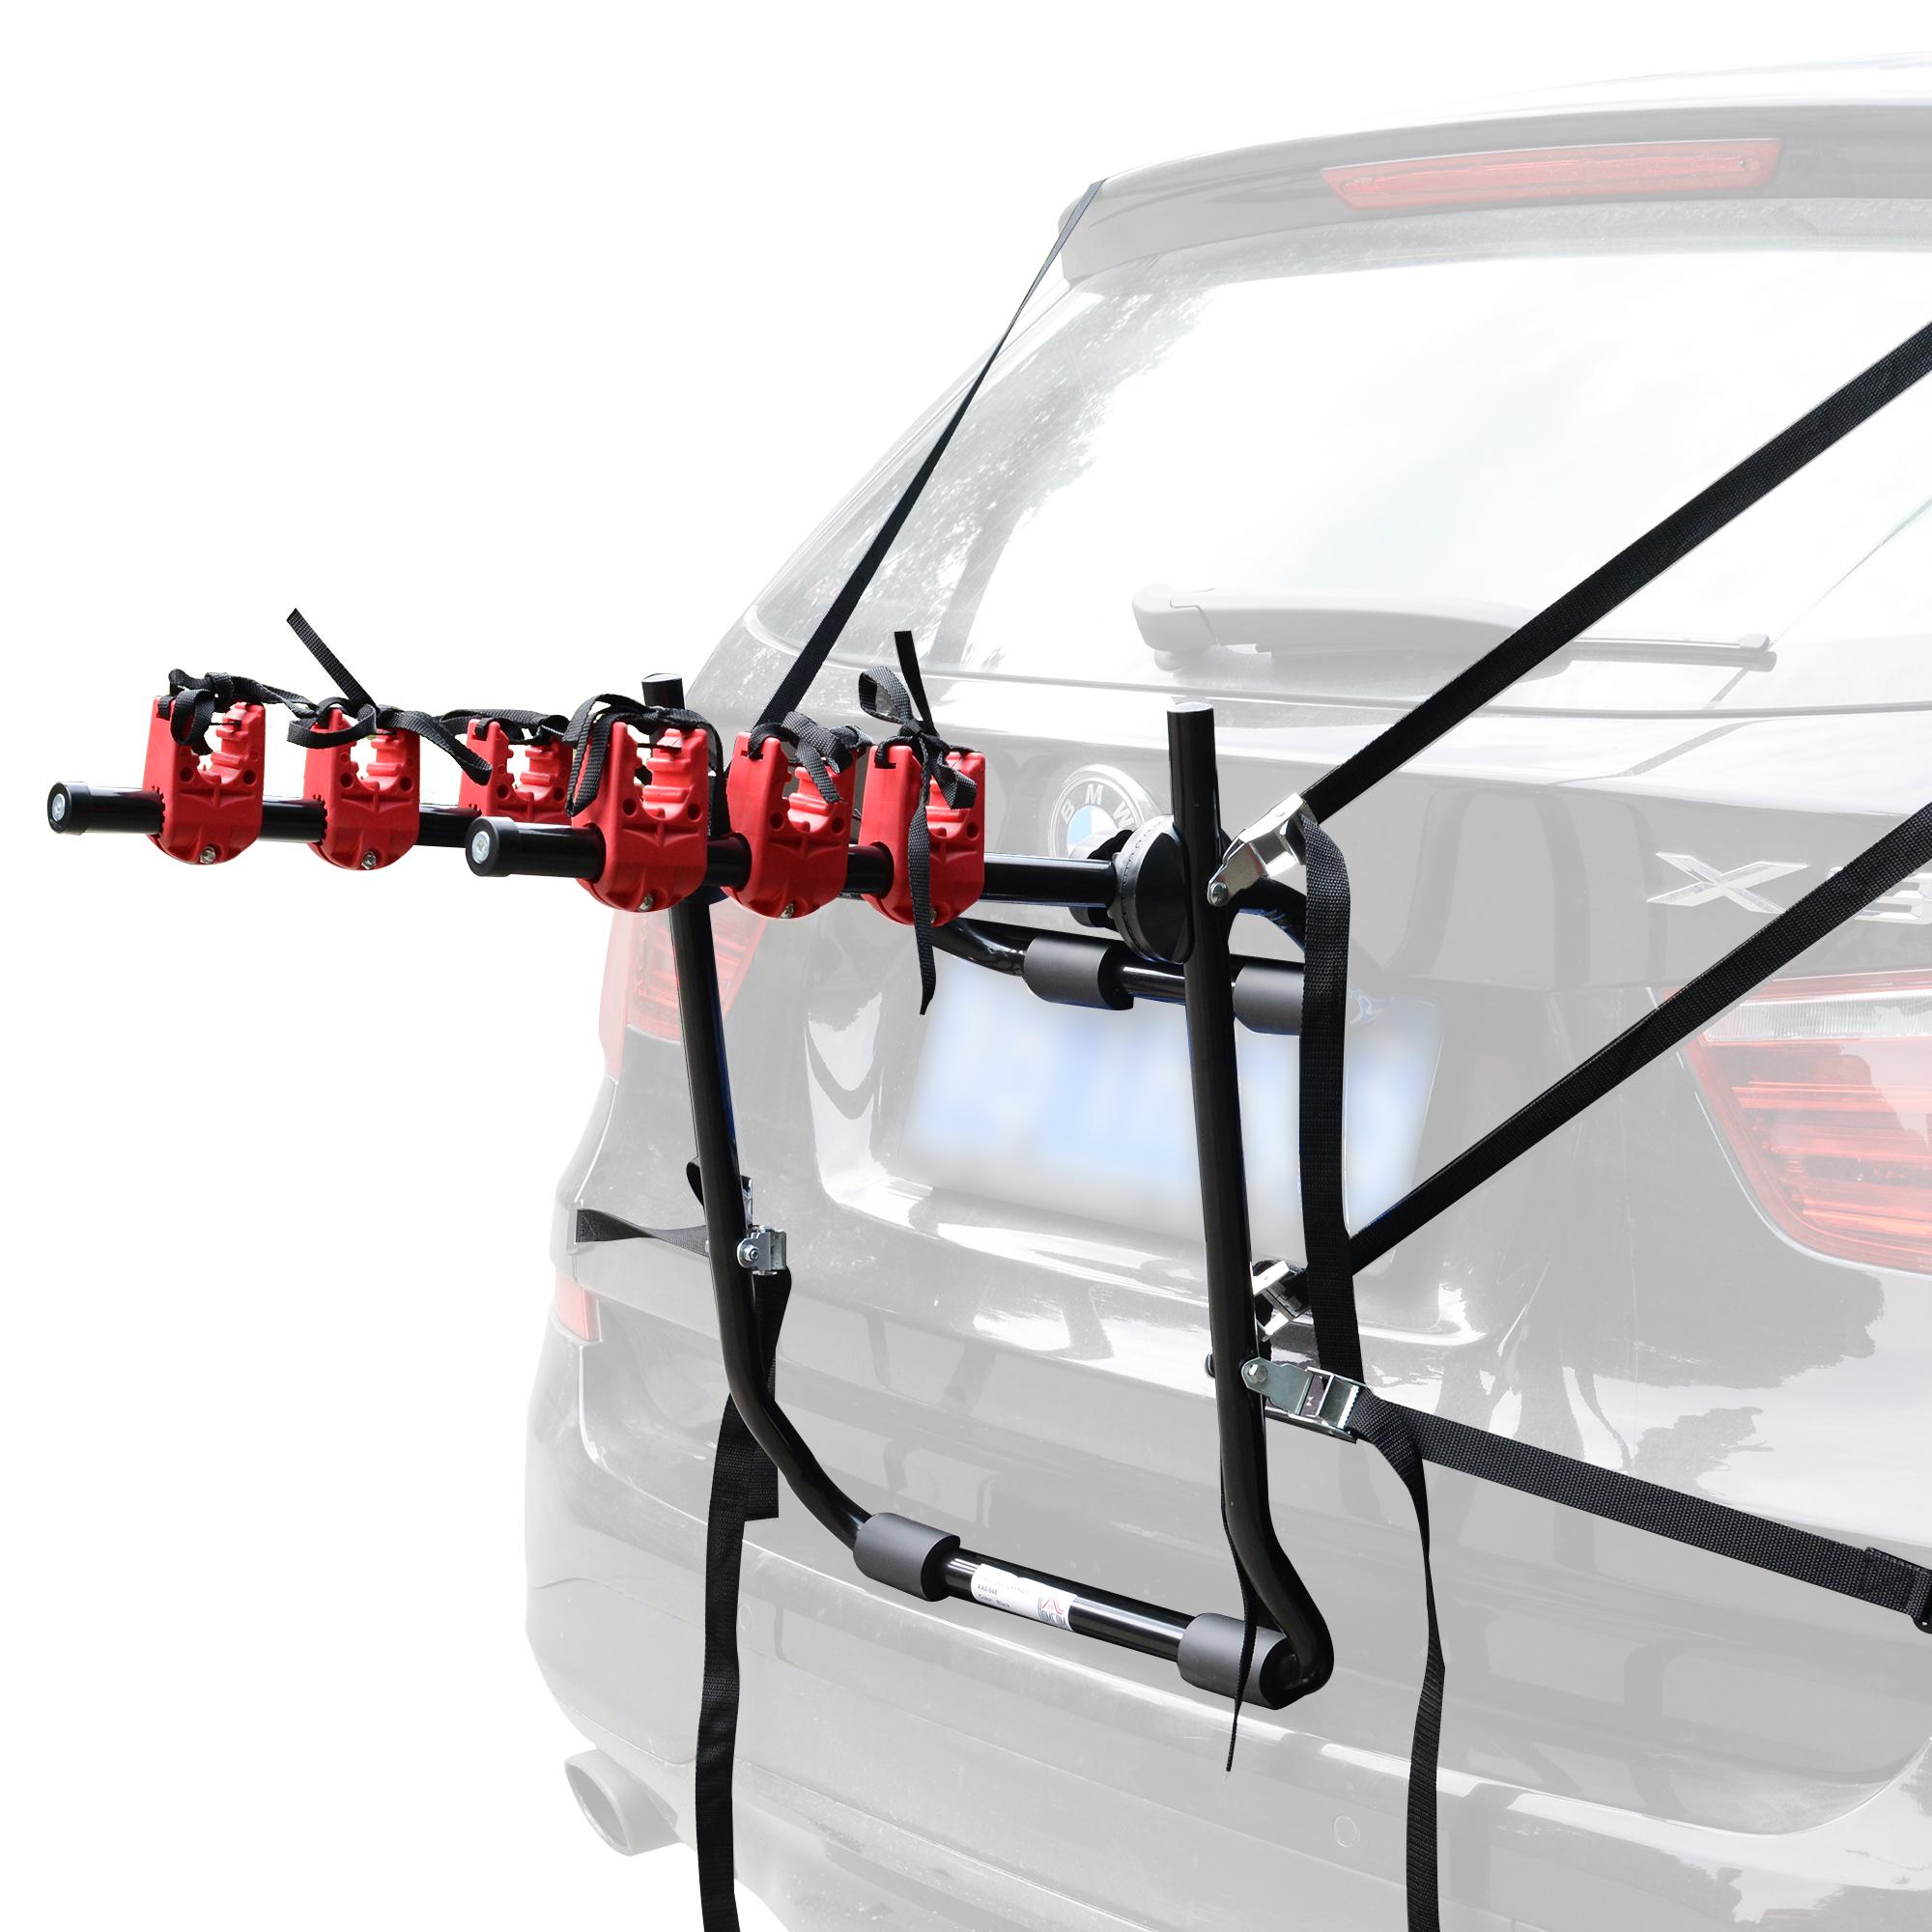 SUVs Hatchbacks XCAR 2-Bike Trunk Mount Bike Rack Bicycle Carrier Universal Fits Most Sedans Minivans